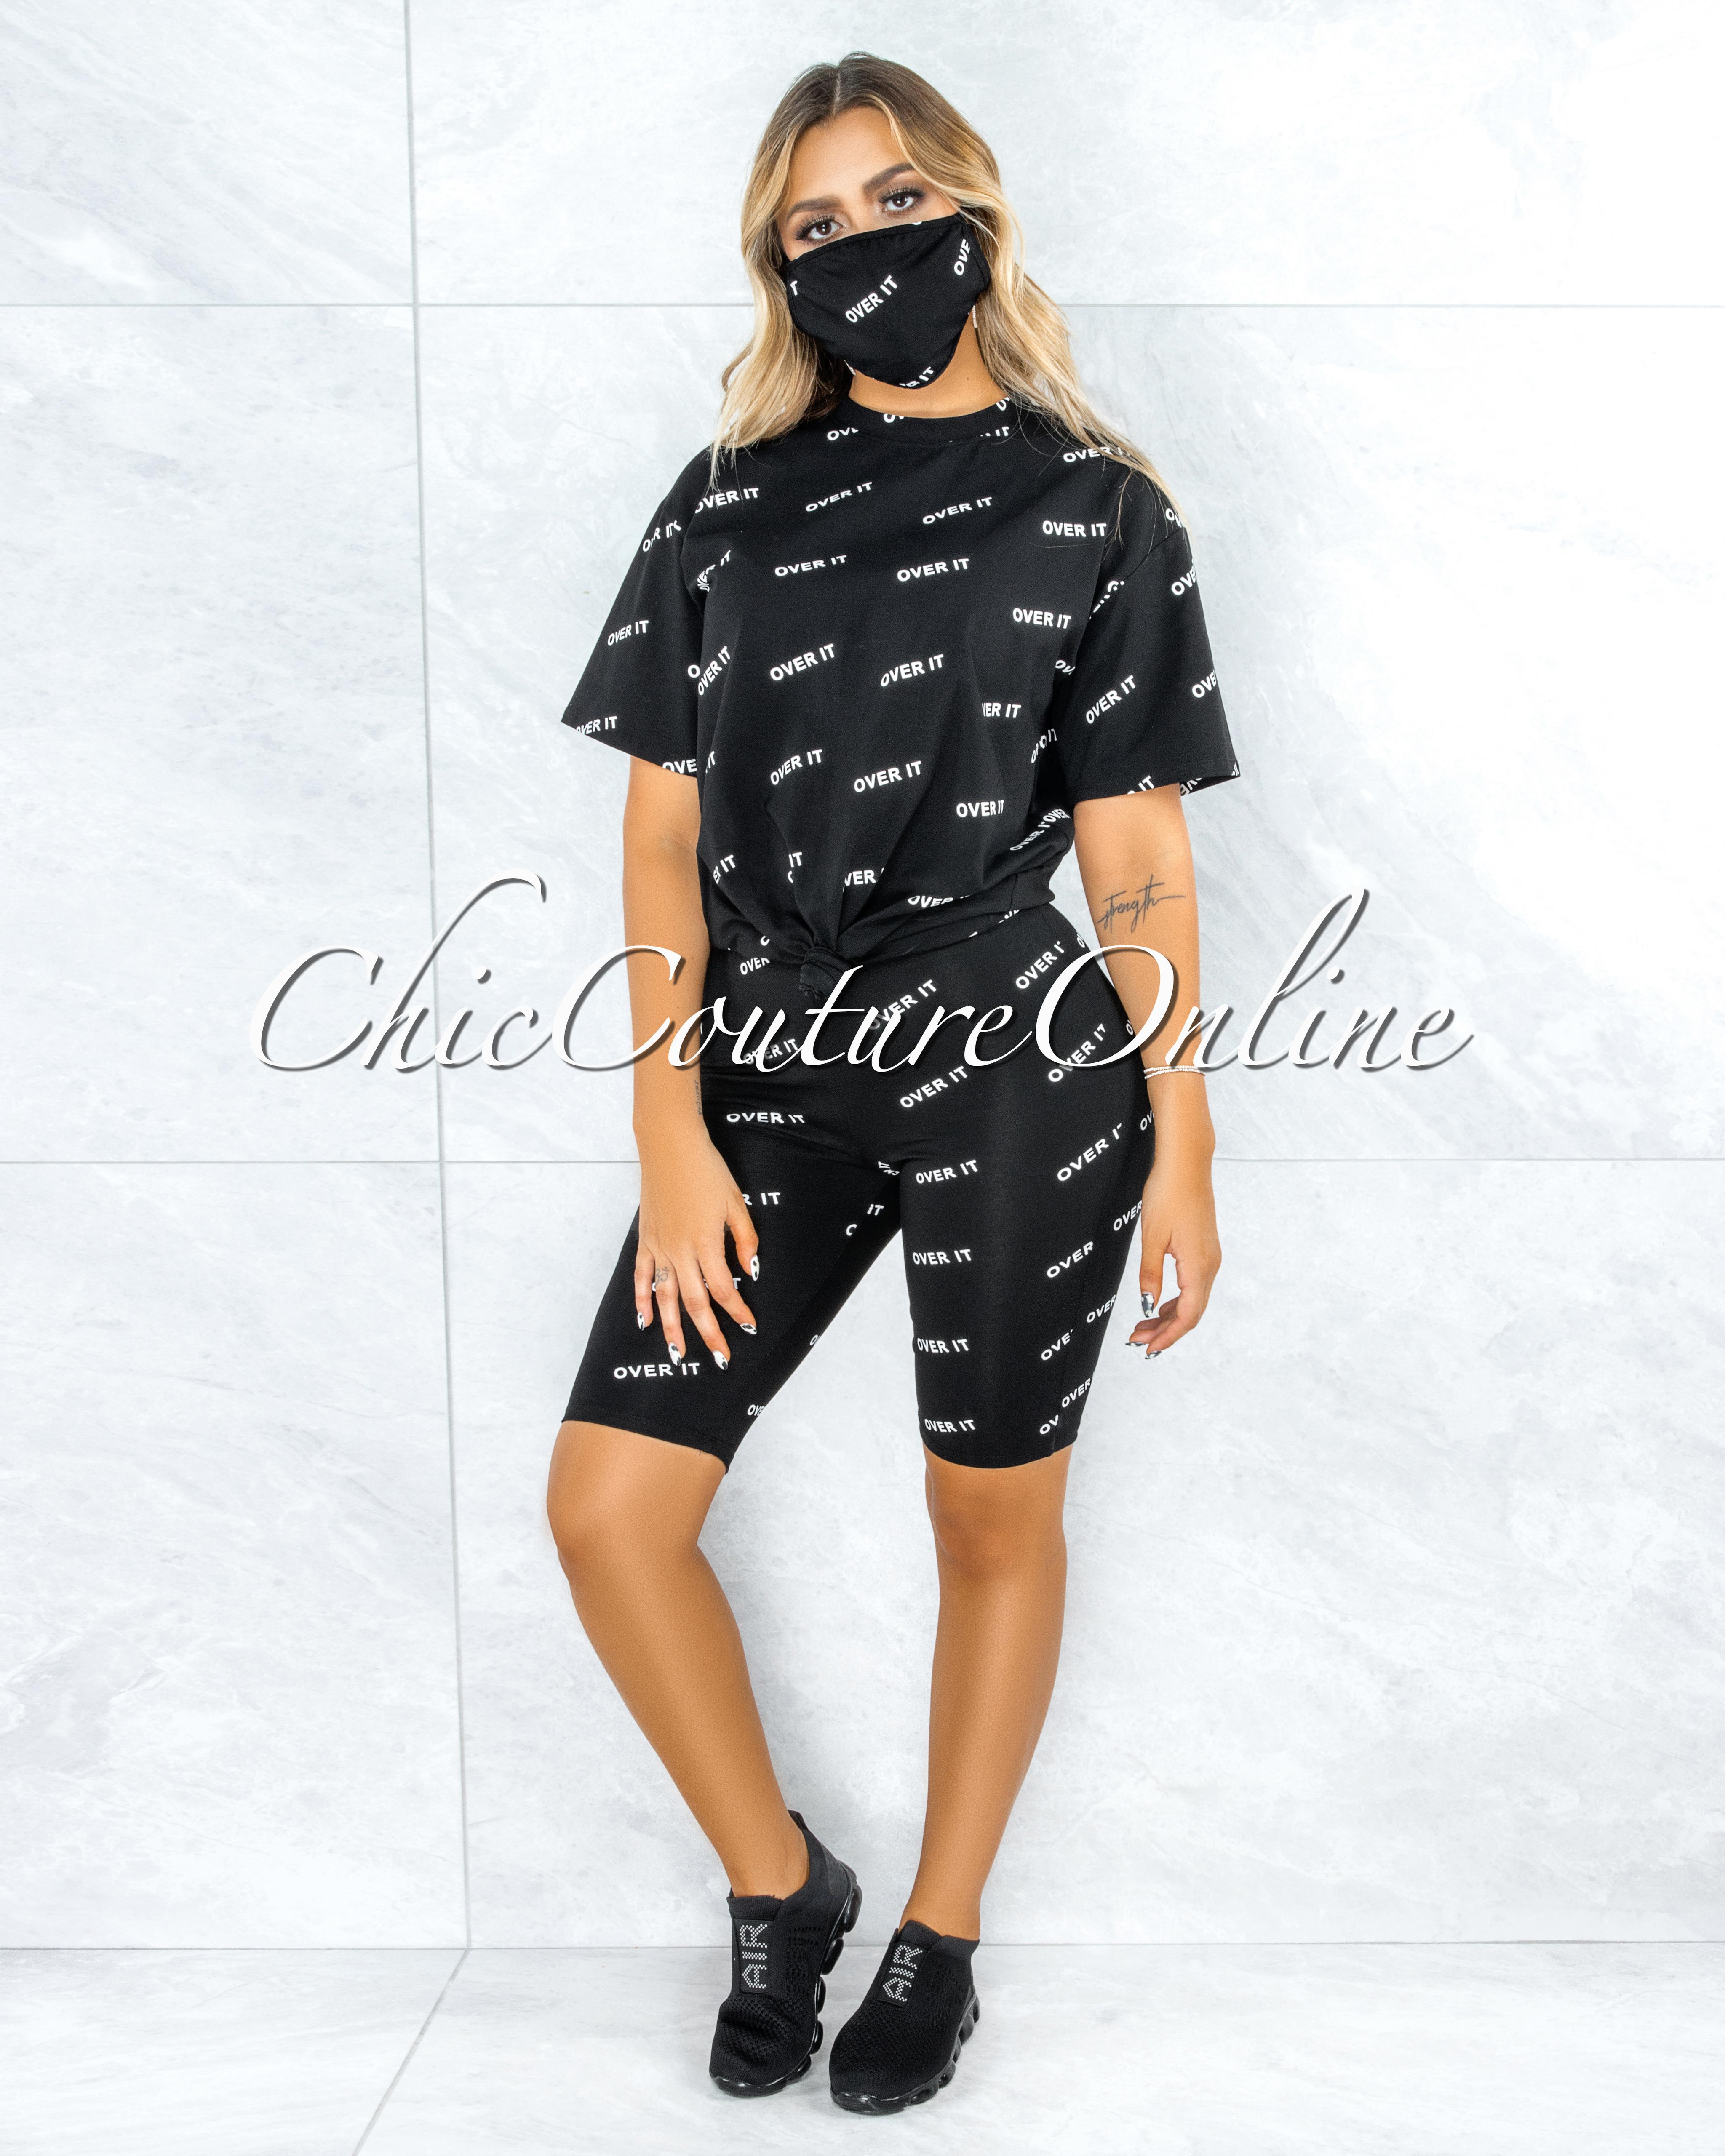 Brunet Black Off-White Graphic Bike Shorts Set w Mask